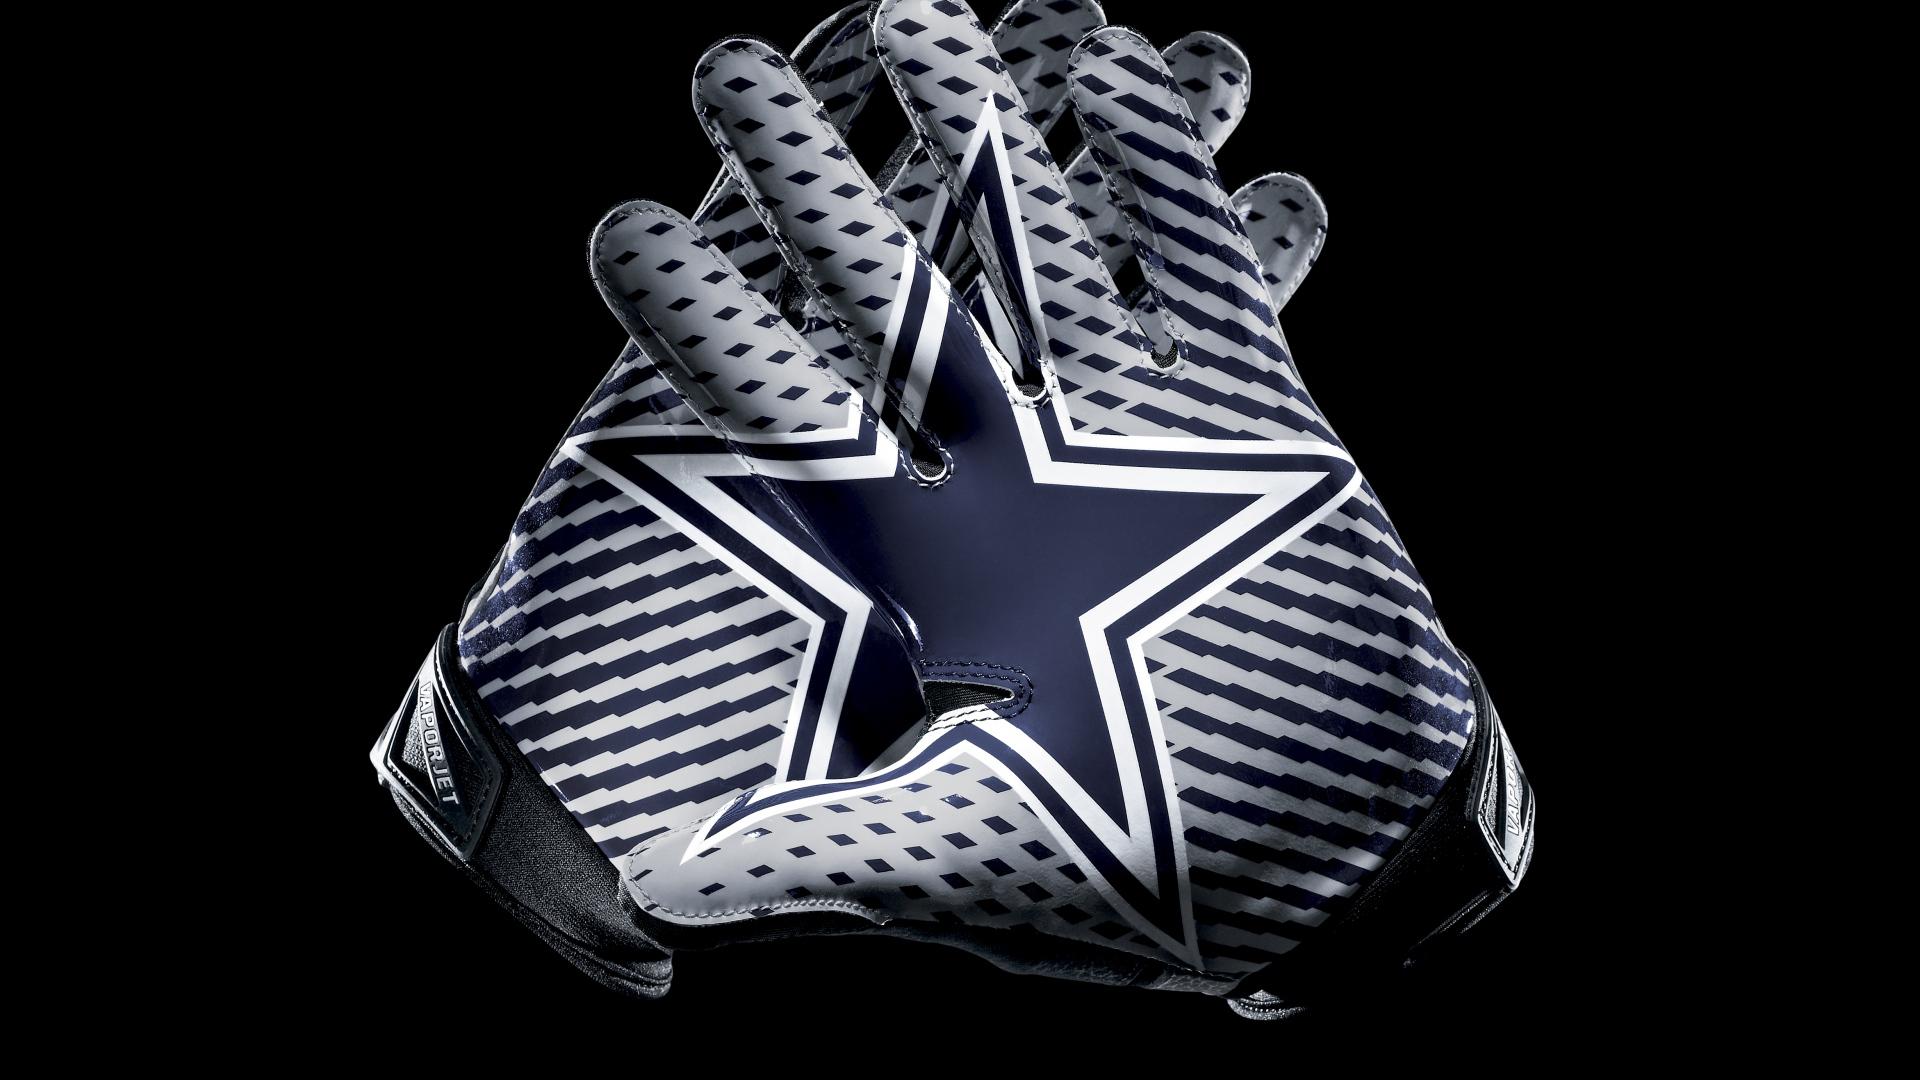 dallas cowboys football club texas arlington 1920x1080